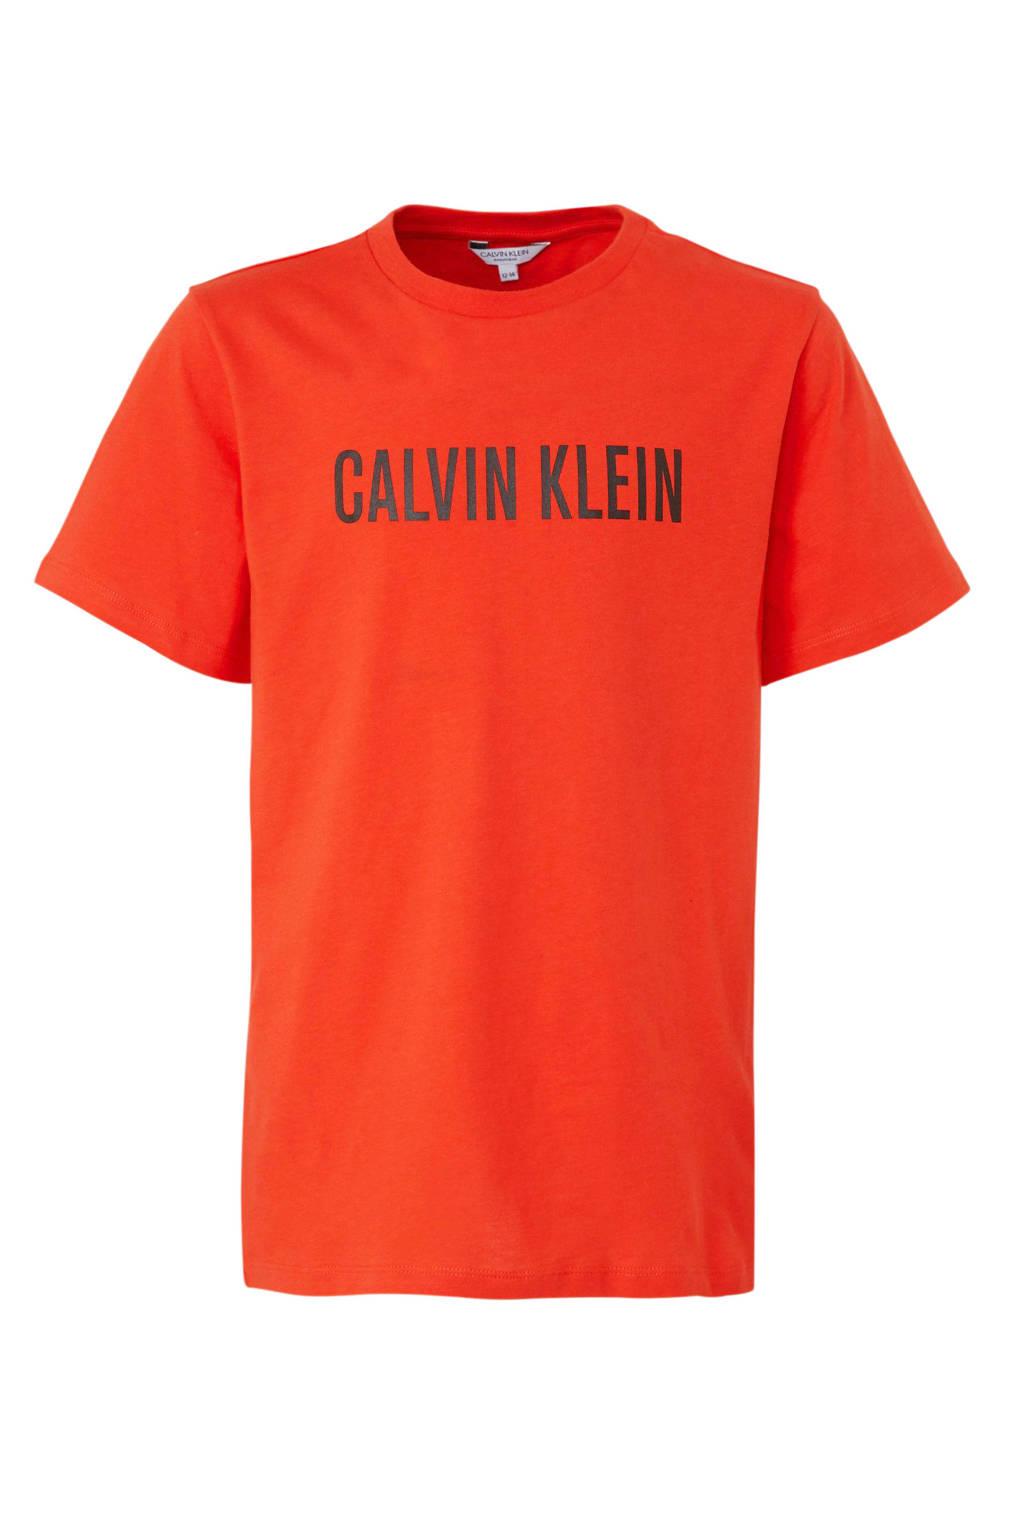 Calvin Klein T-shirt met logo rood, Rood